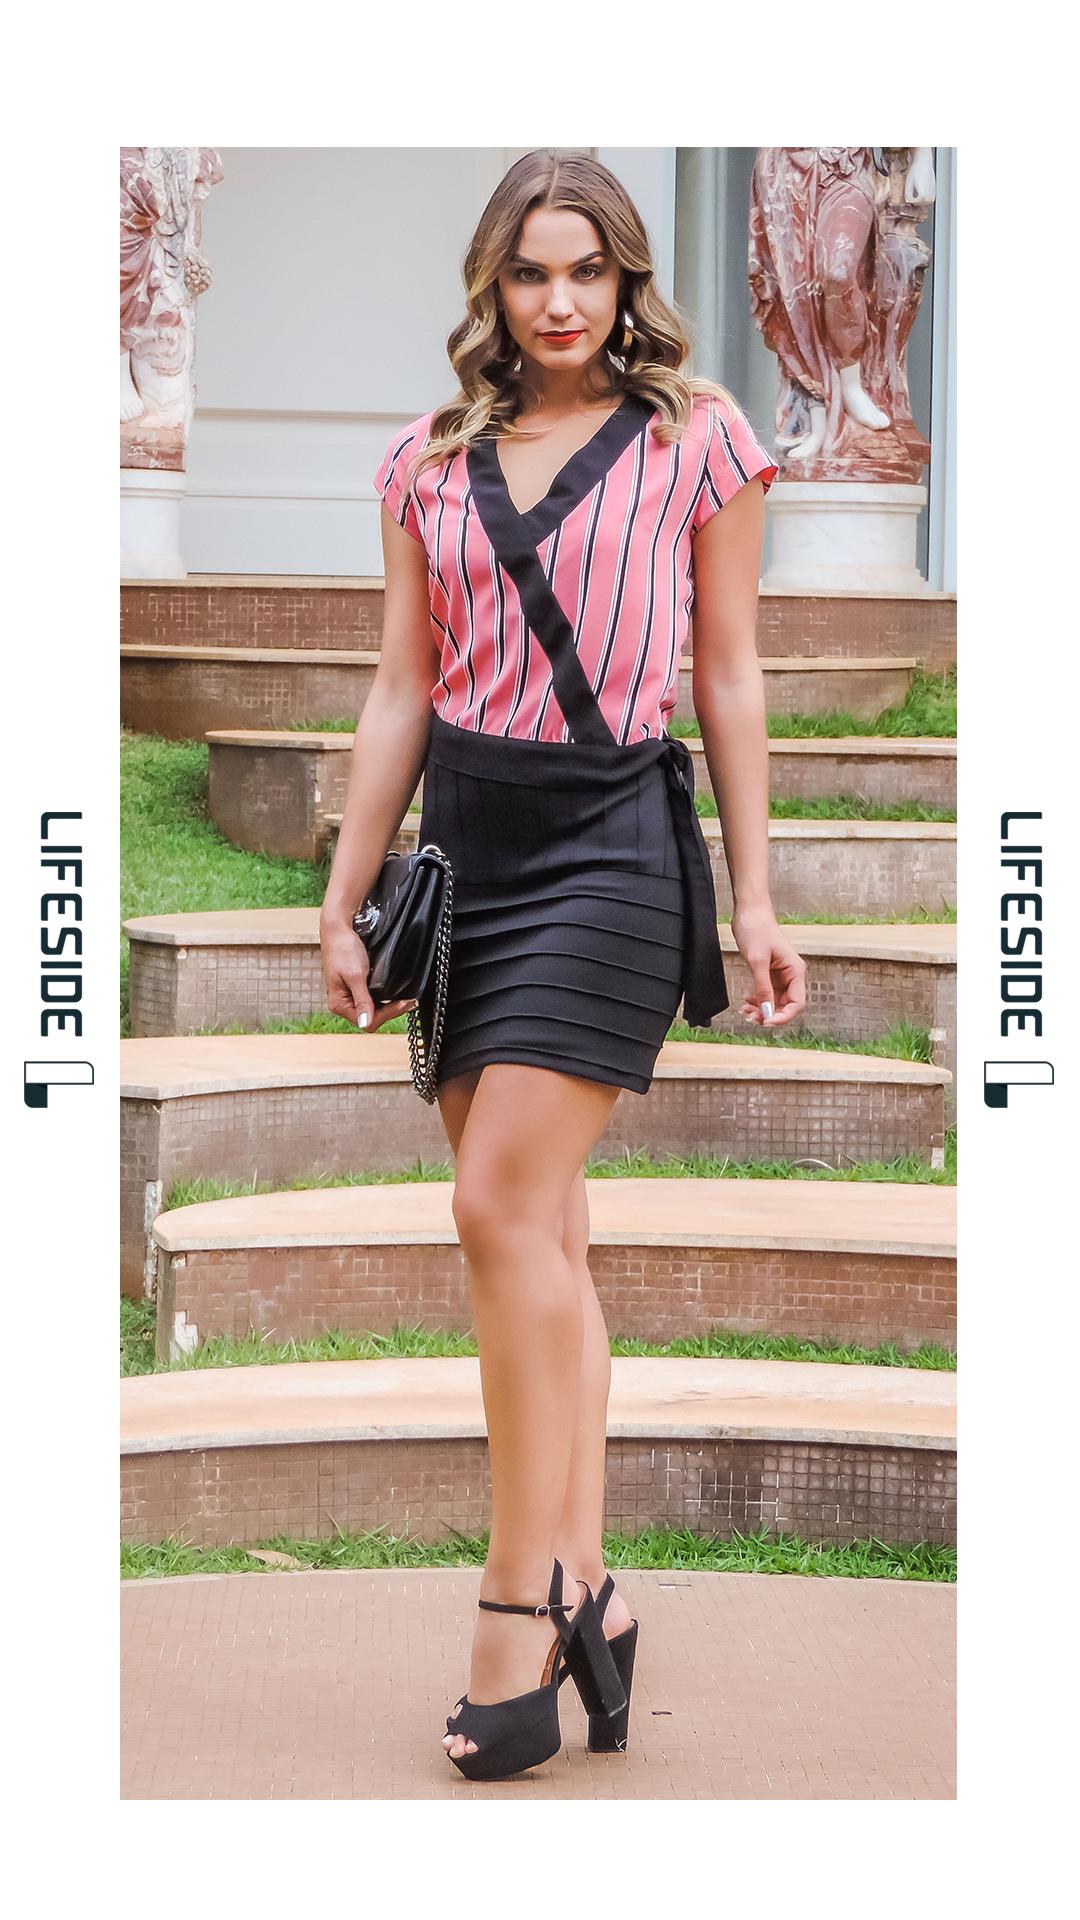 44416974e Lifeside moda feminina primavera blusa listrada transpassada fashion  modafeminina lookdodia looks lifeside lookbook png 1080x1920 Moda